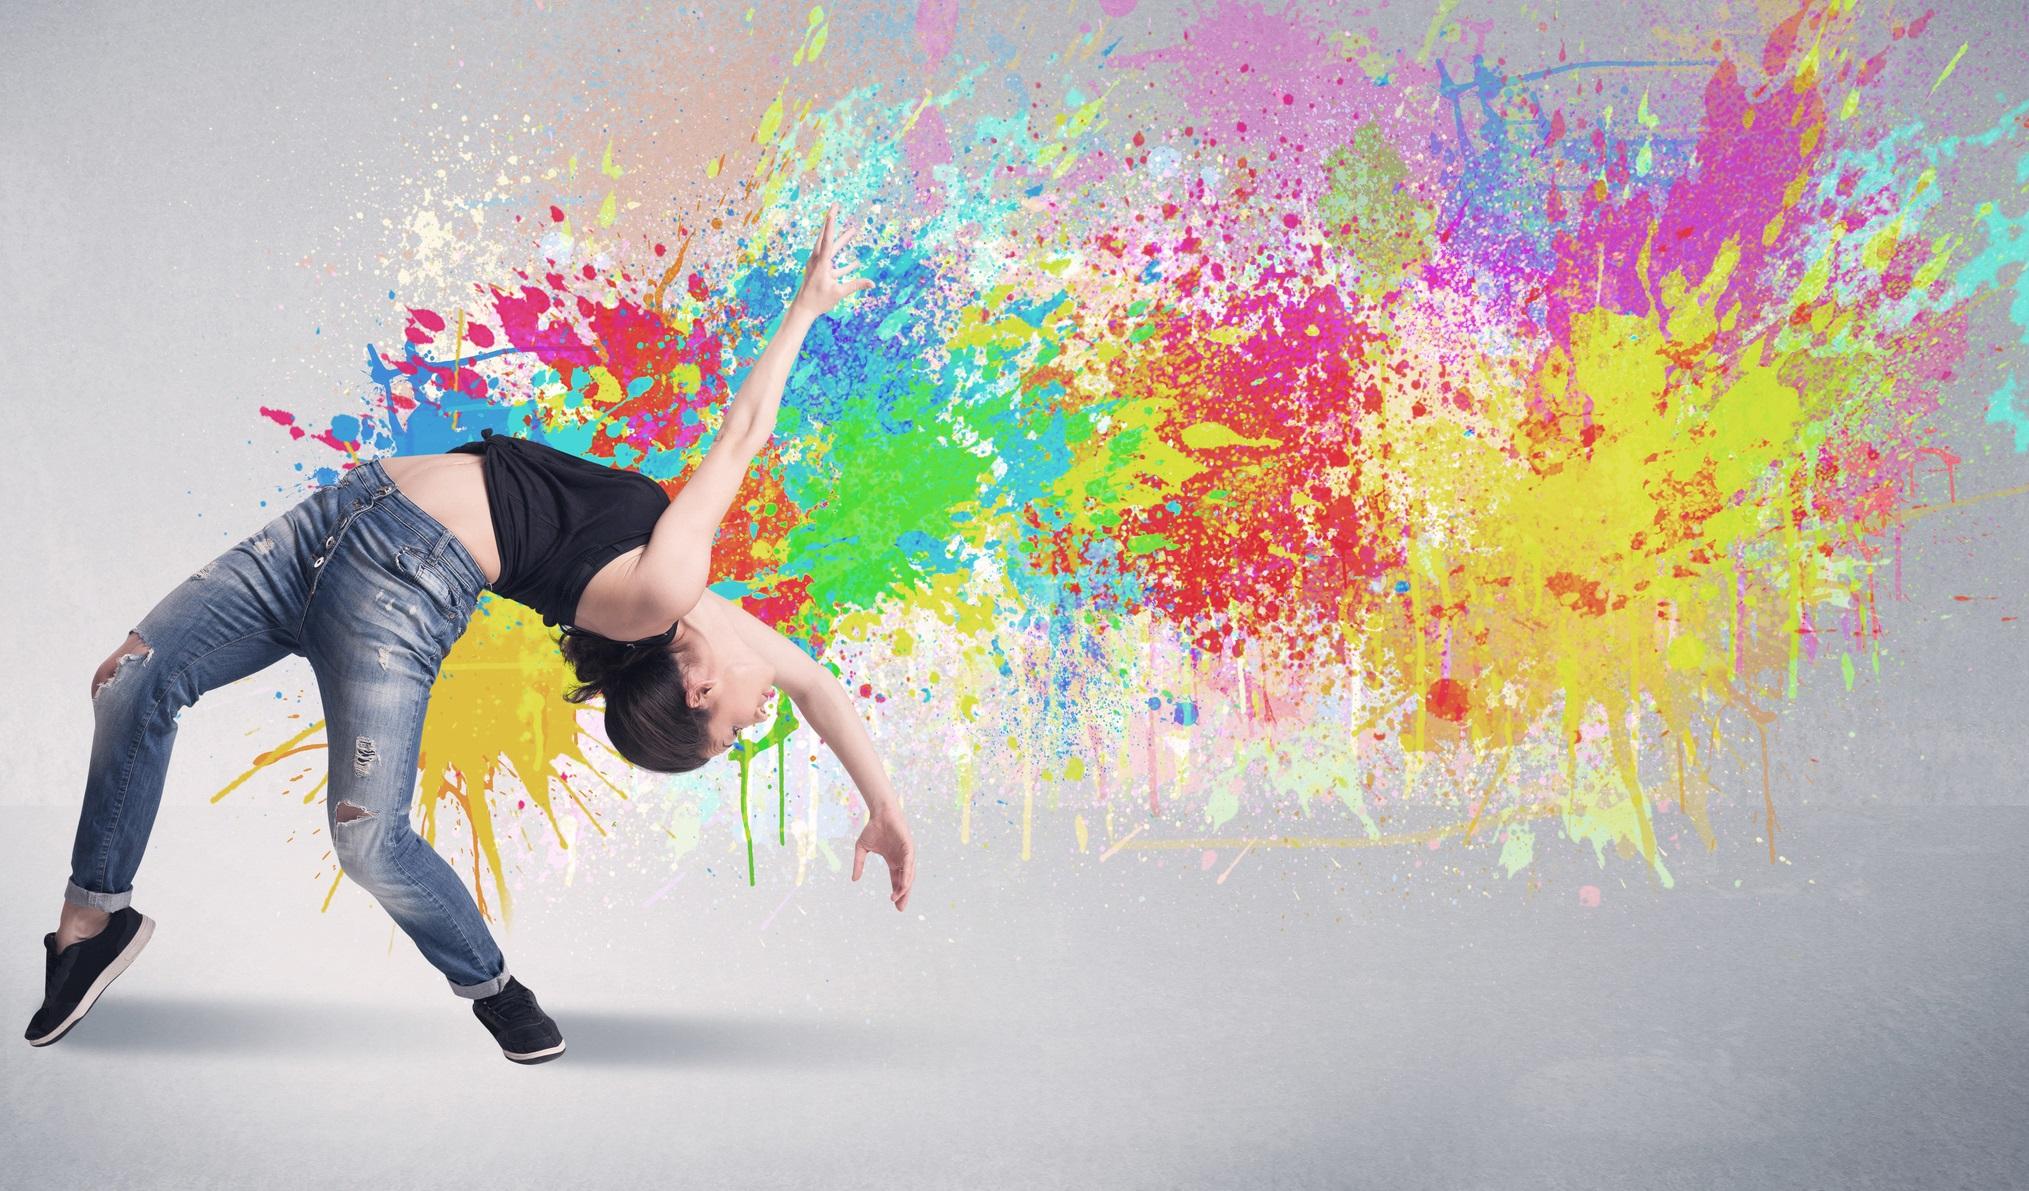 Dancing girls color photo